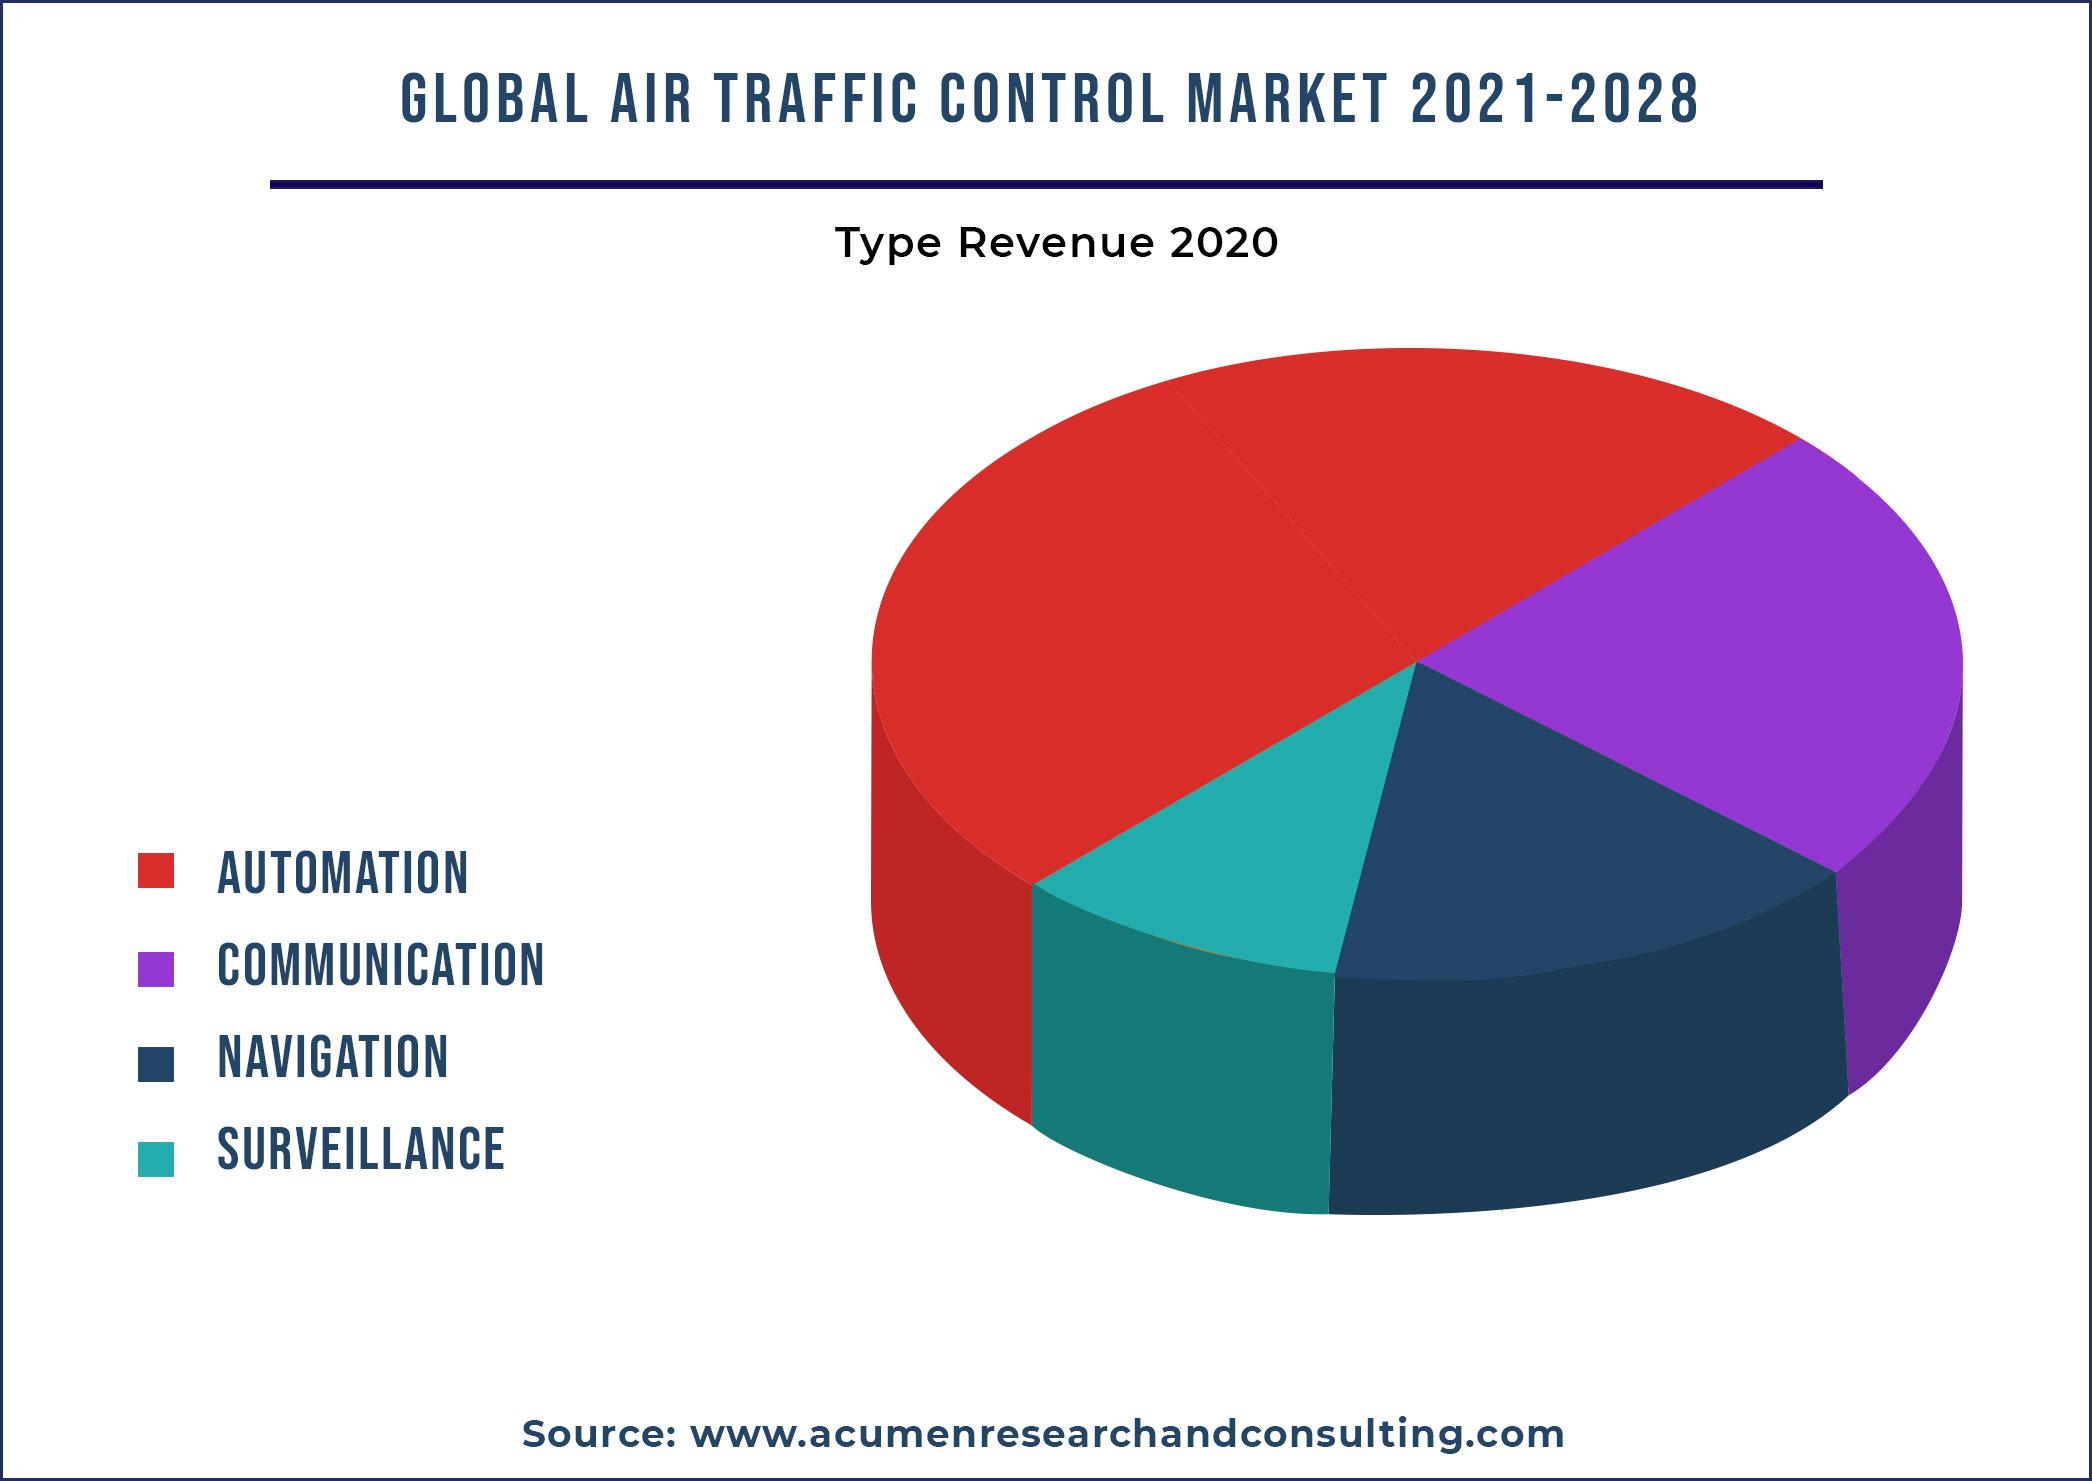 Air Traffic Control Market By Application 2021-2028